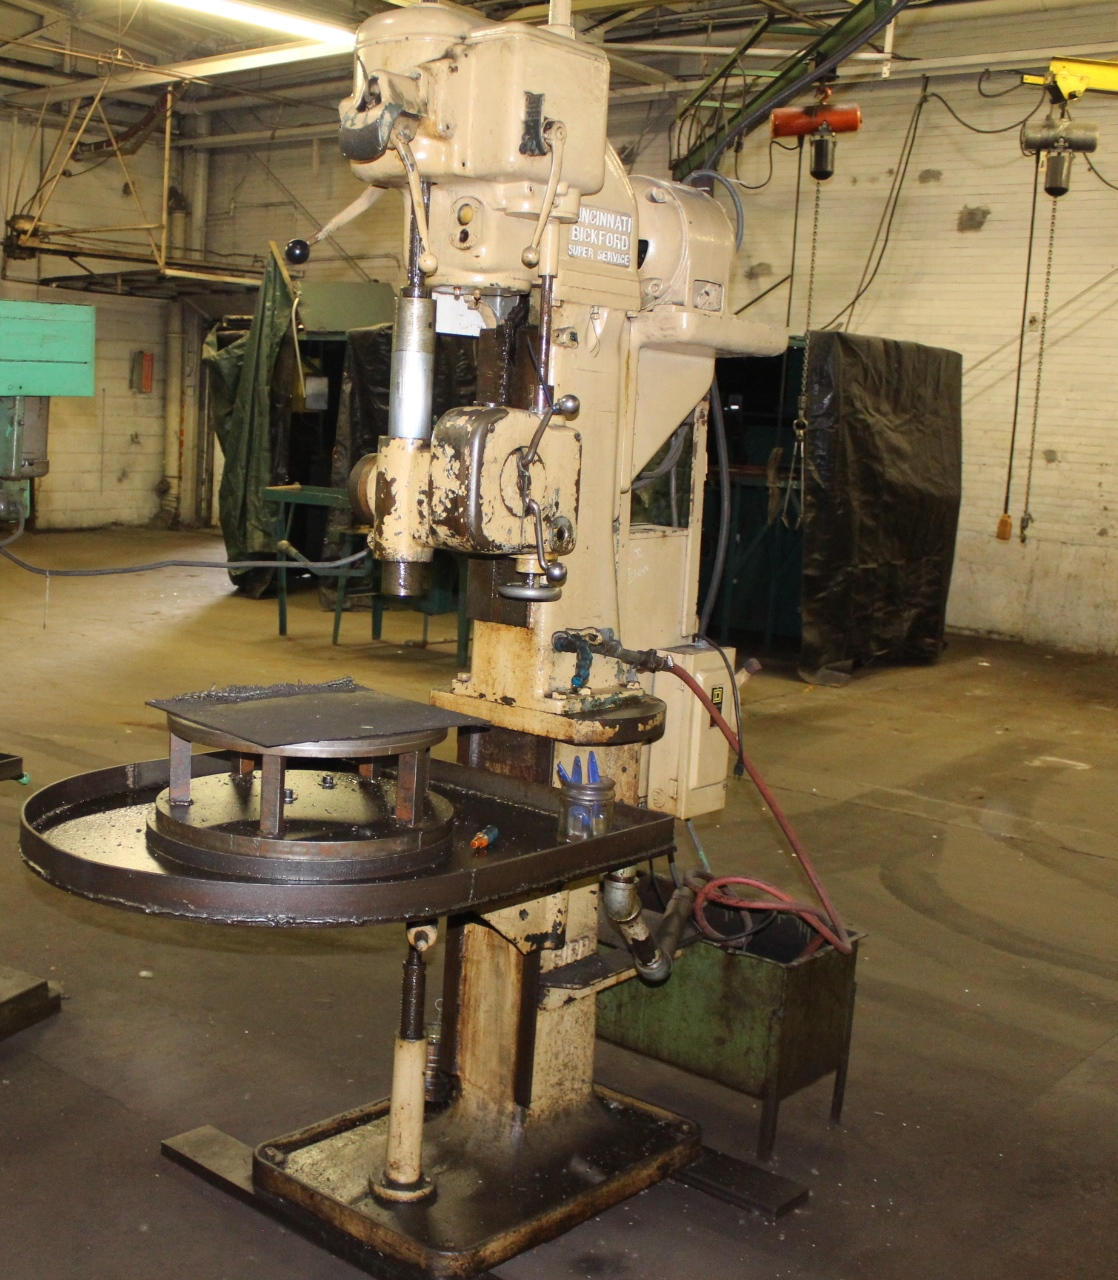 "Lot 63 - Cincinnati Bickford Super Service 21"" Single Spindle Drill Press"